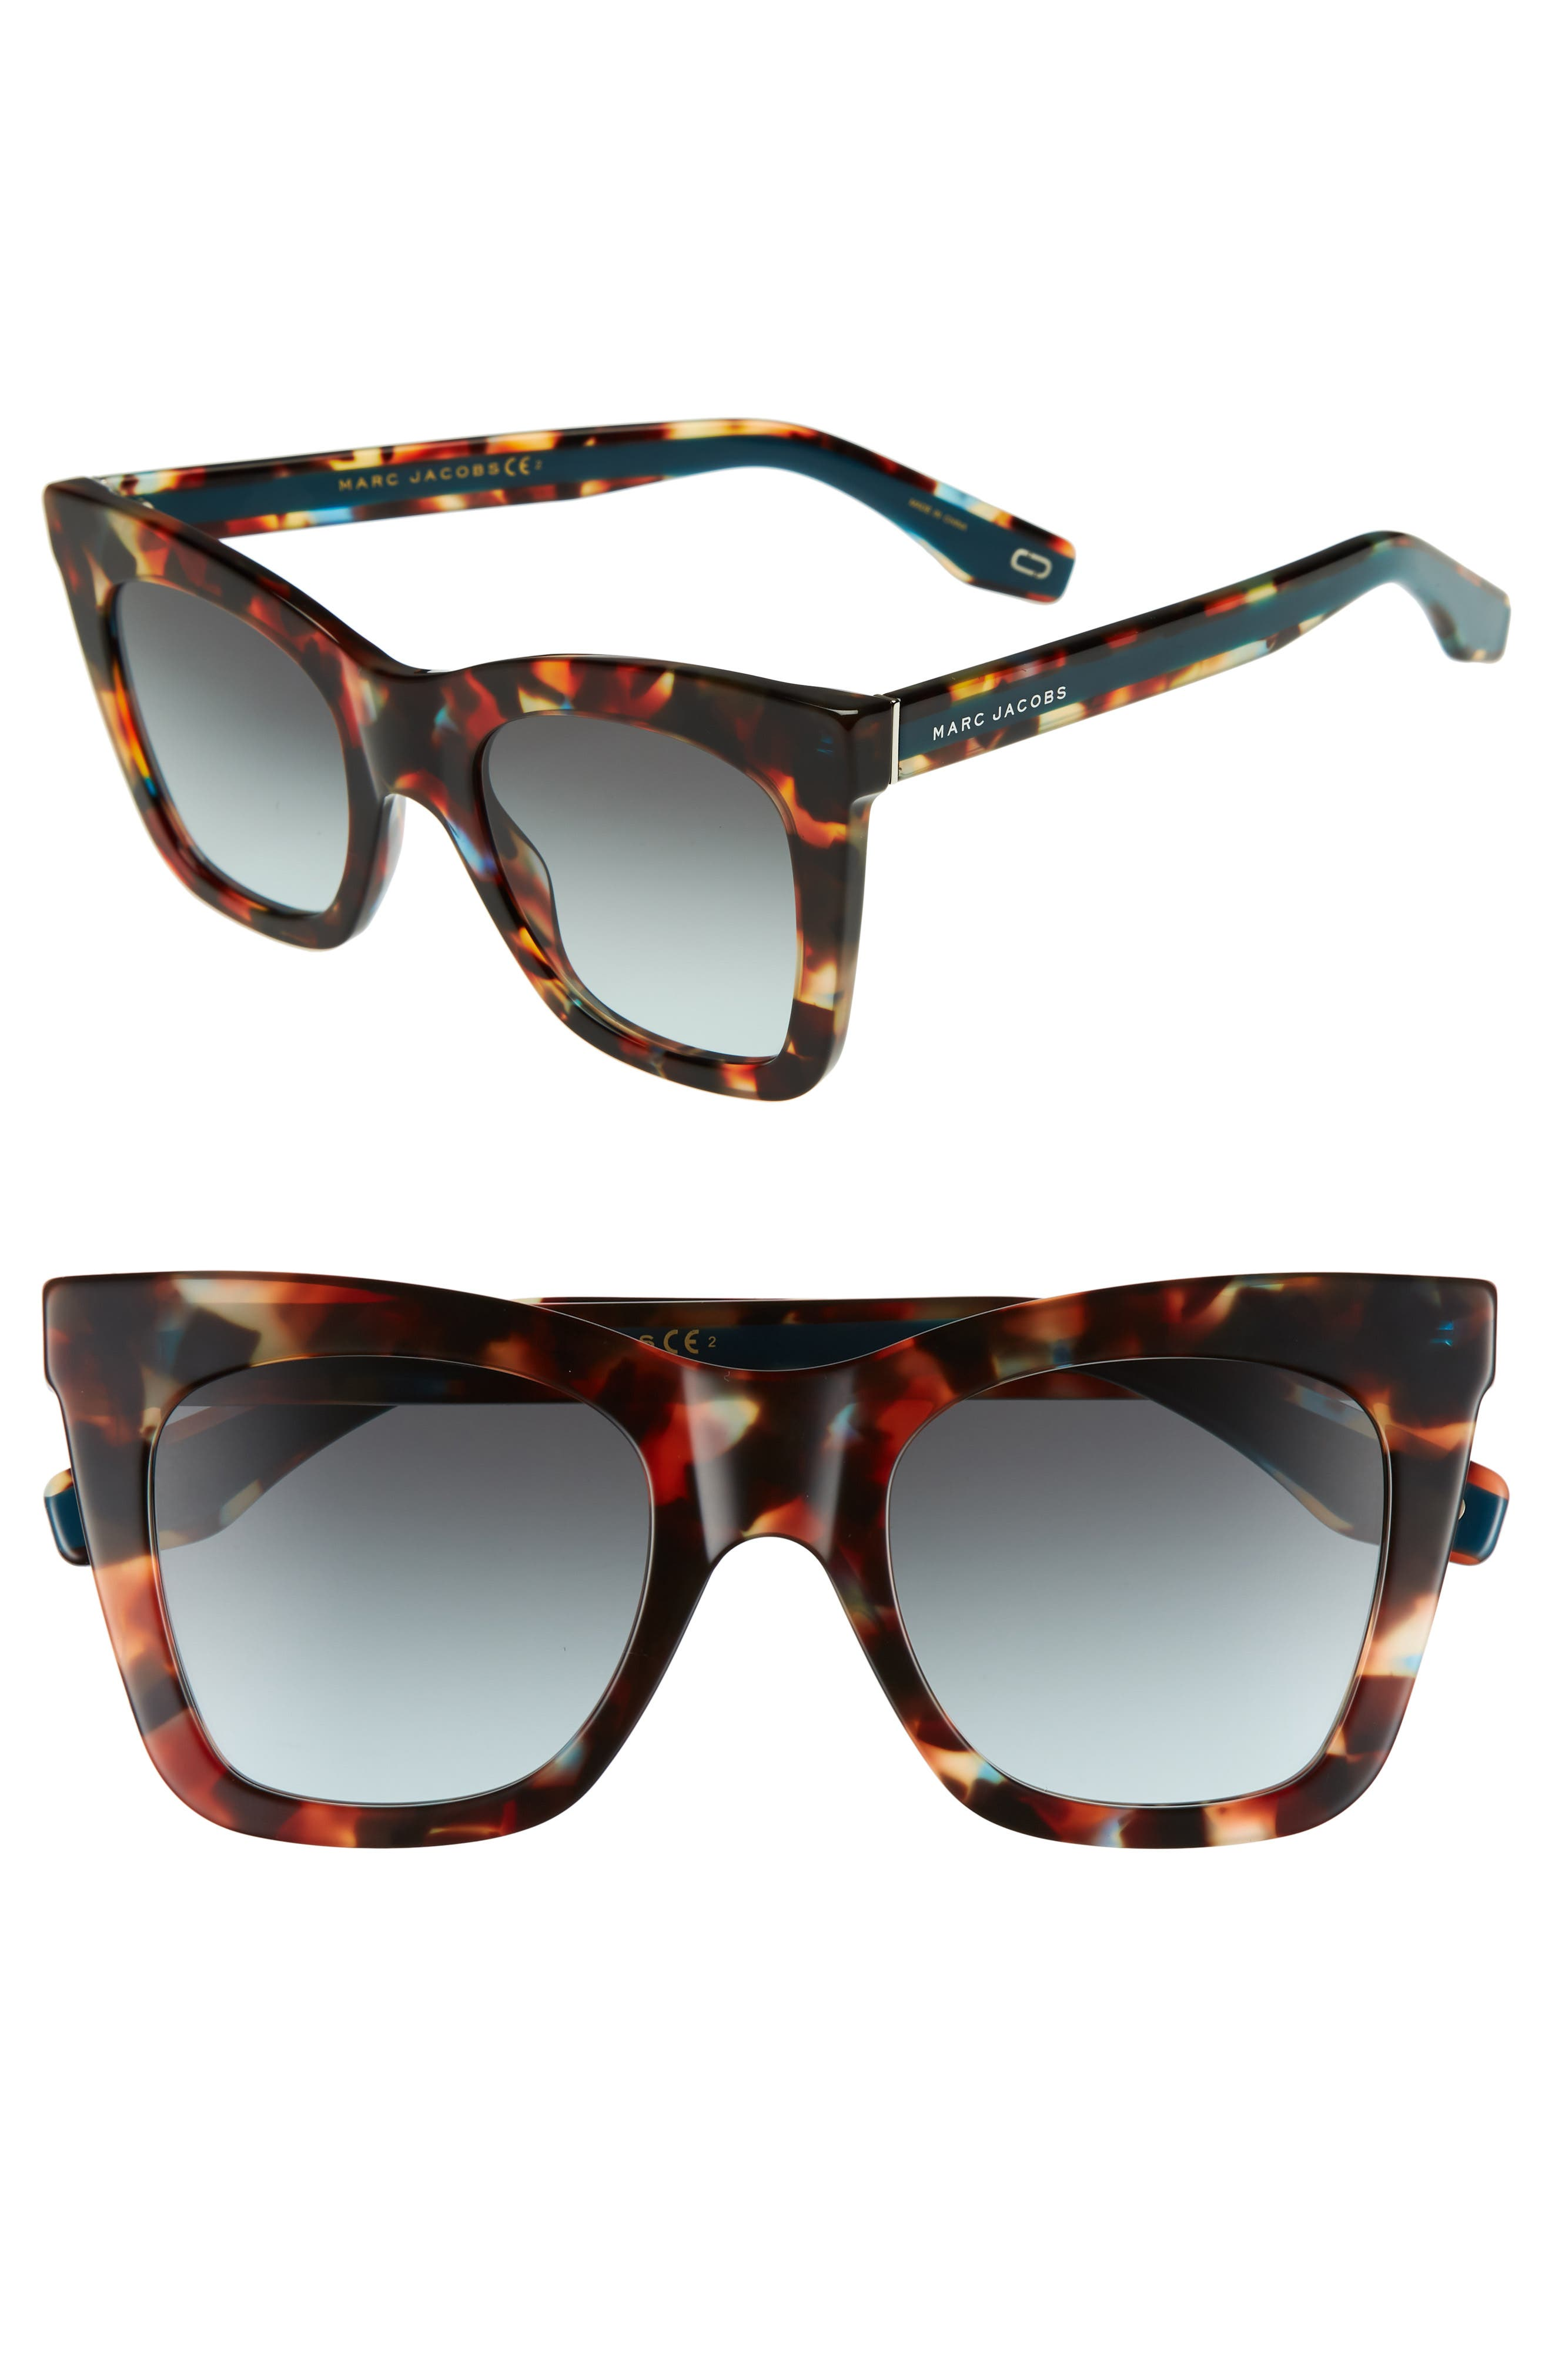 50mm Cat Eye Sunglasses,                             Main thumbnail 1, color,                             Havnturqu